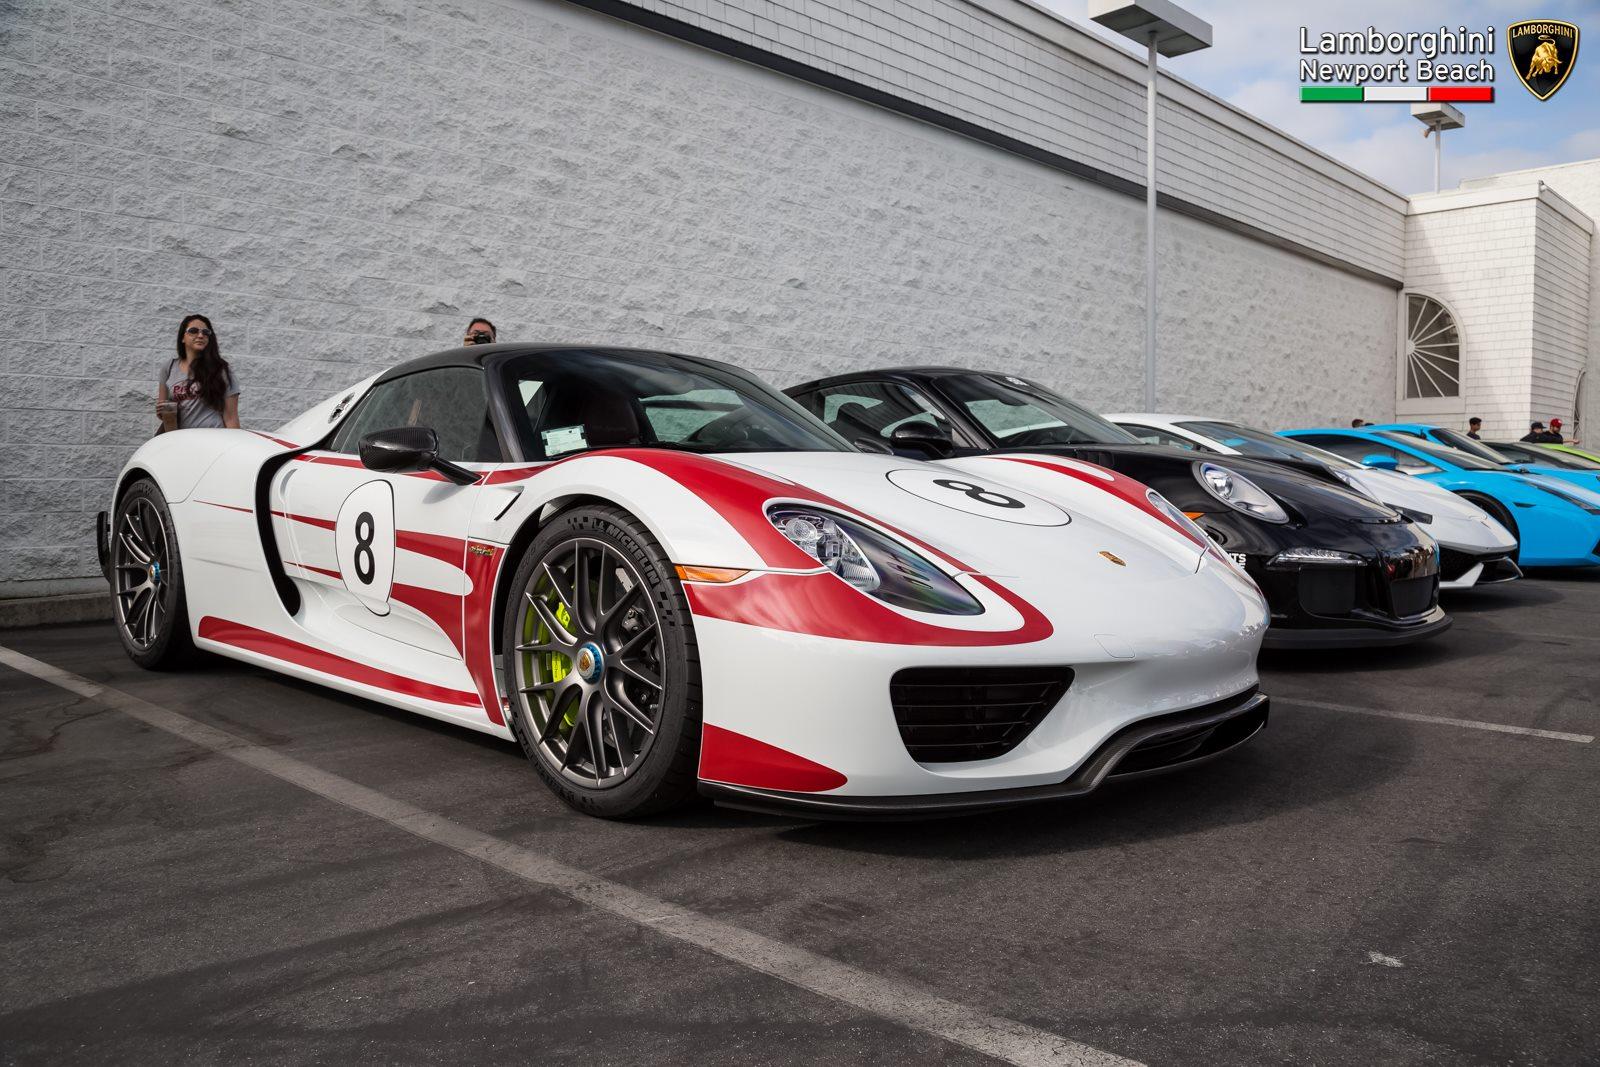 ... Lamborghini Newport Beach Supercar Show. Porsche 918 Spyder